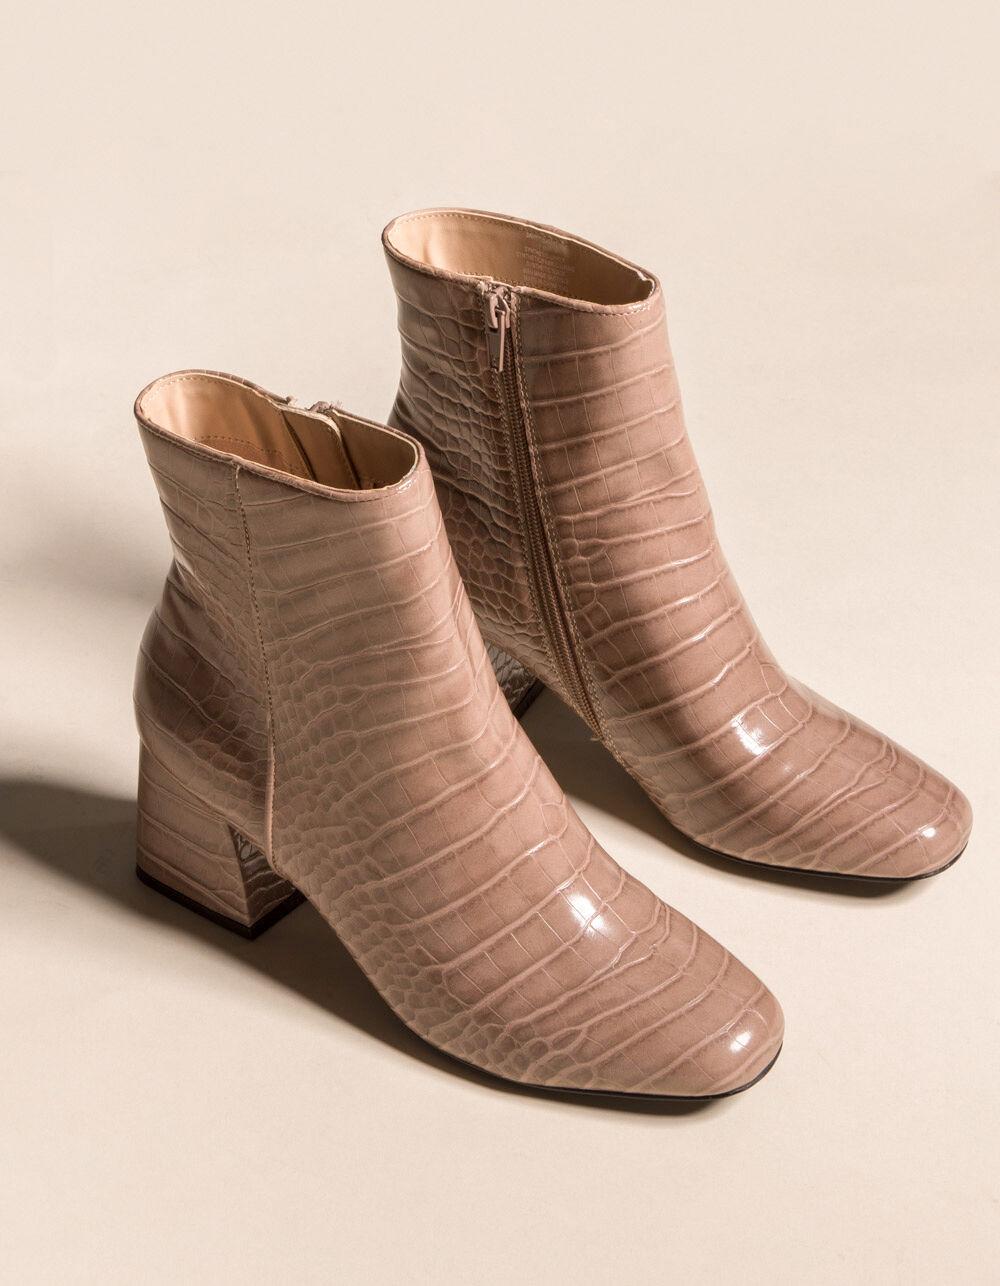 STEVE MADDEN Davist Tan Croc Boots